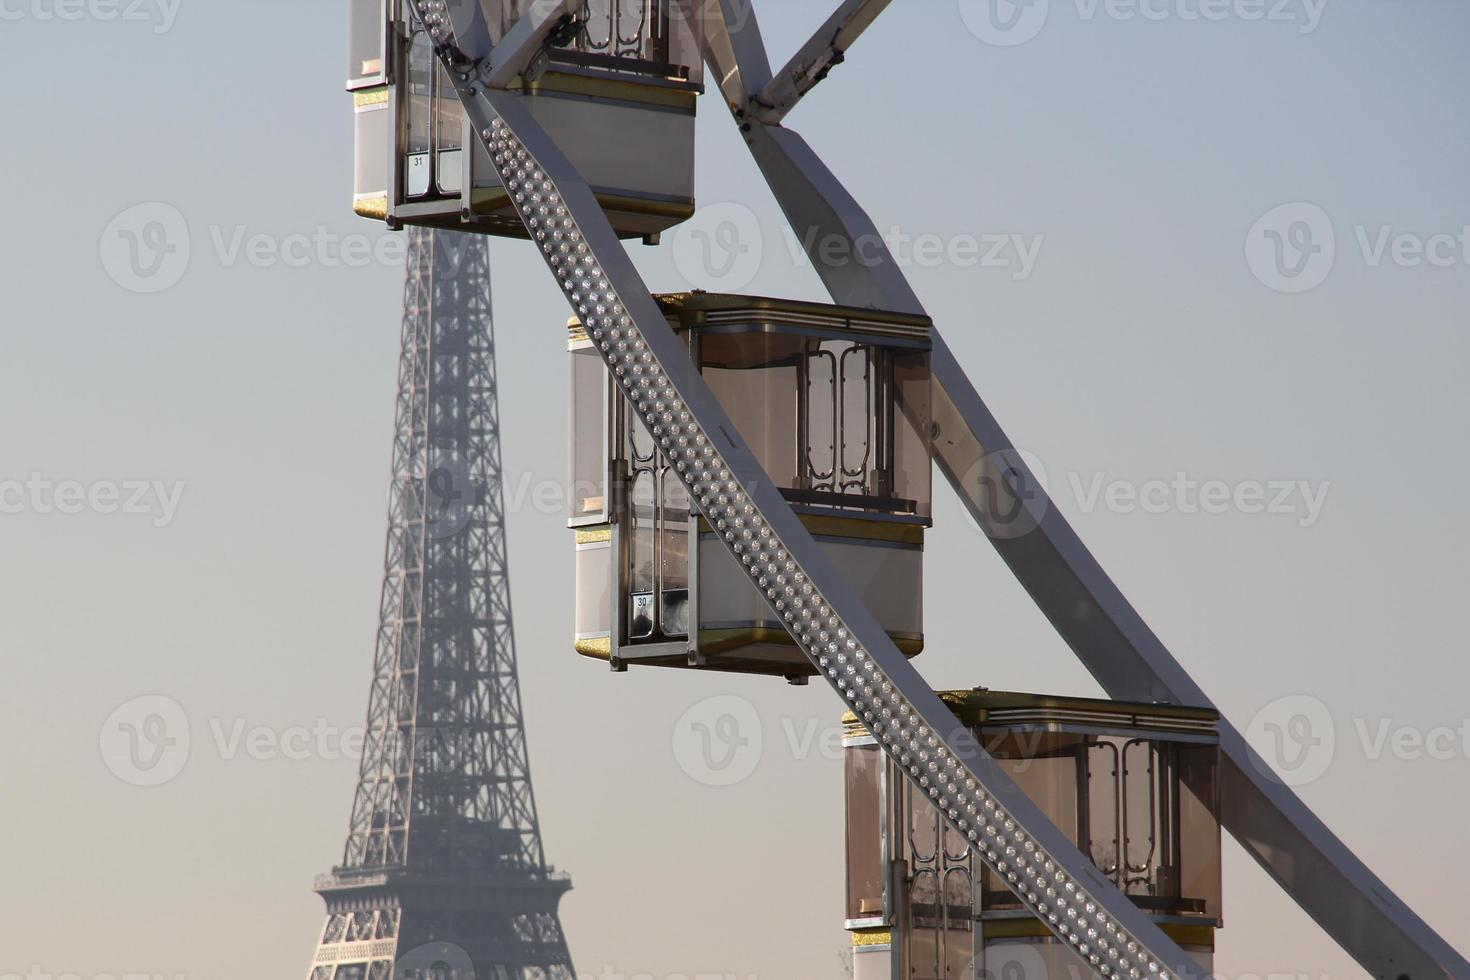 perspectiva parisina al atardecer foto